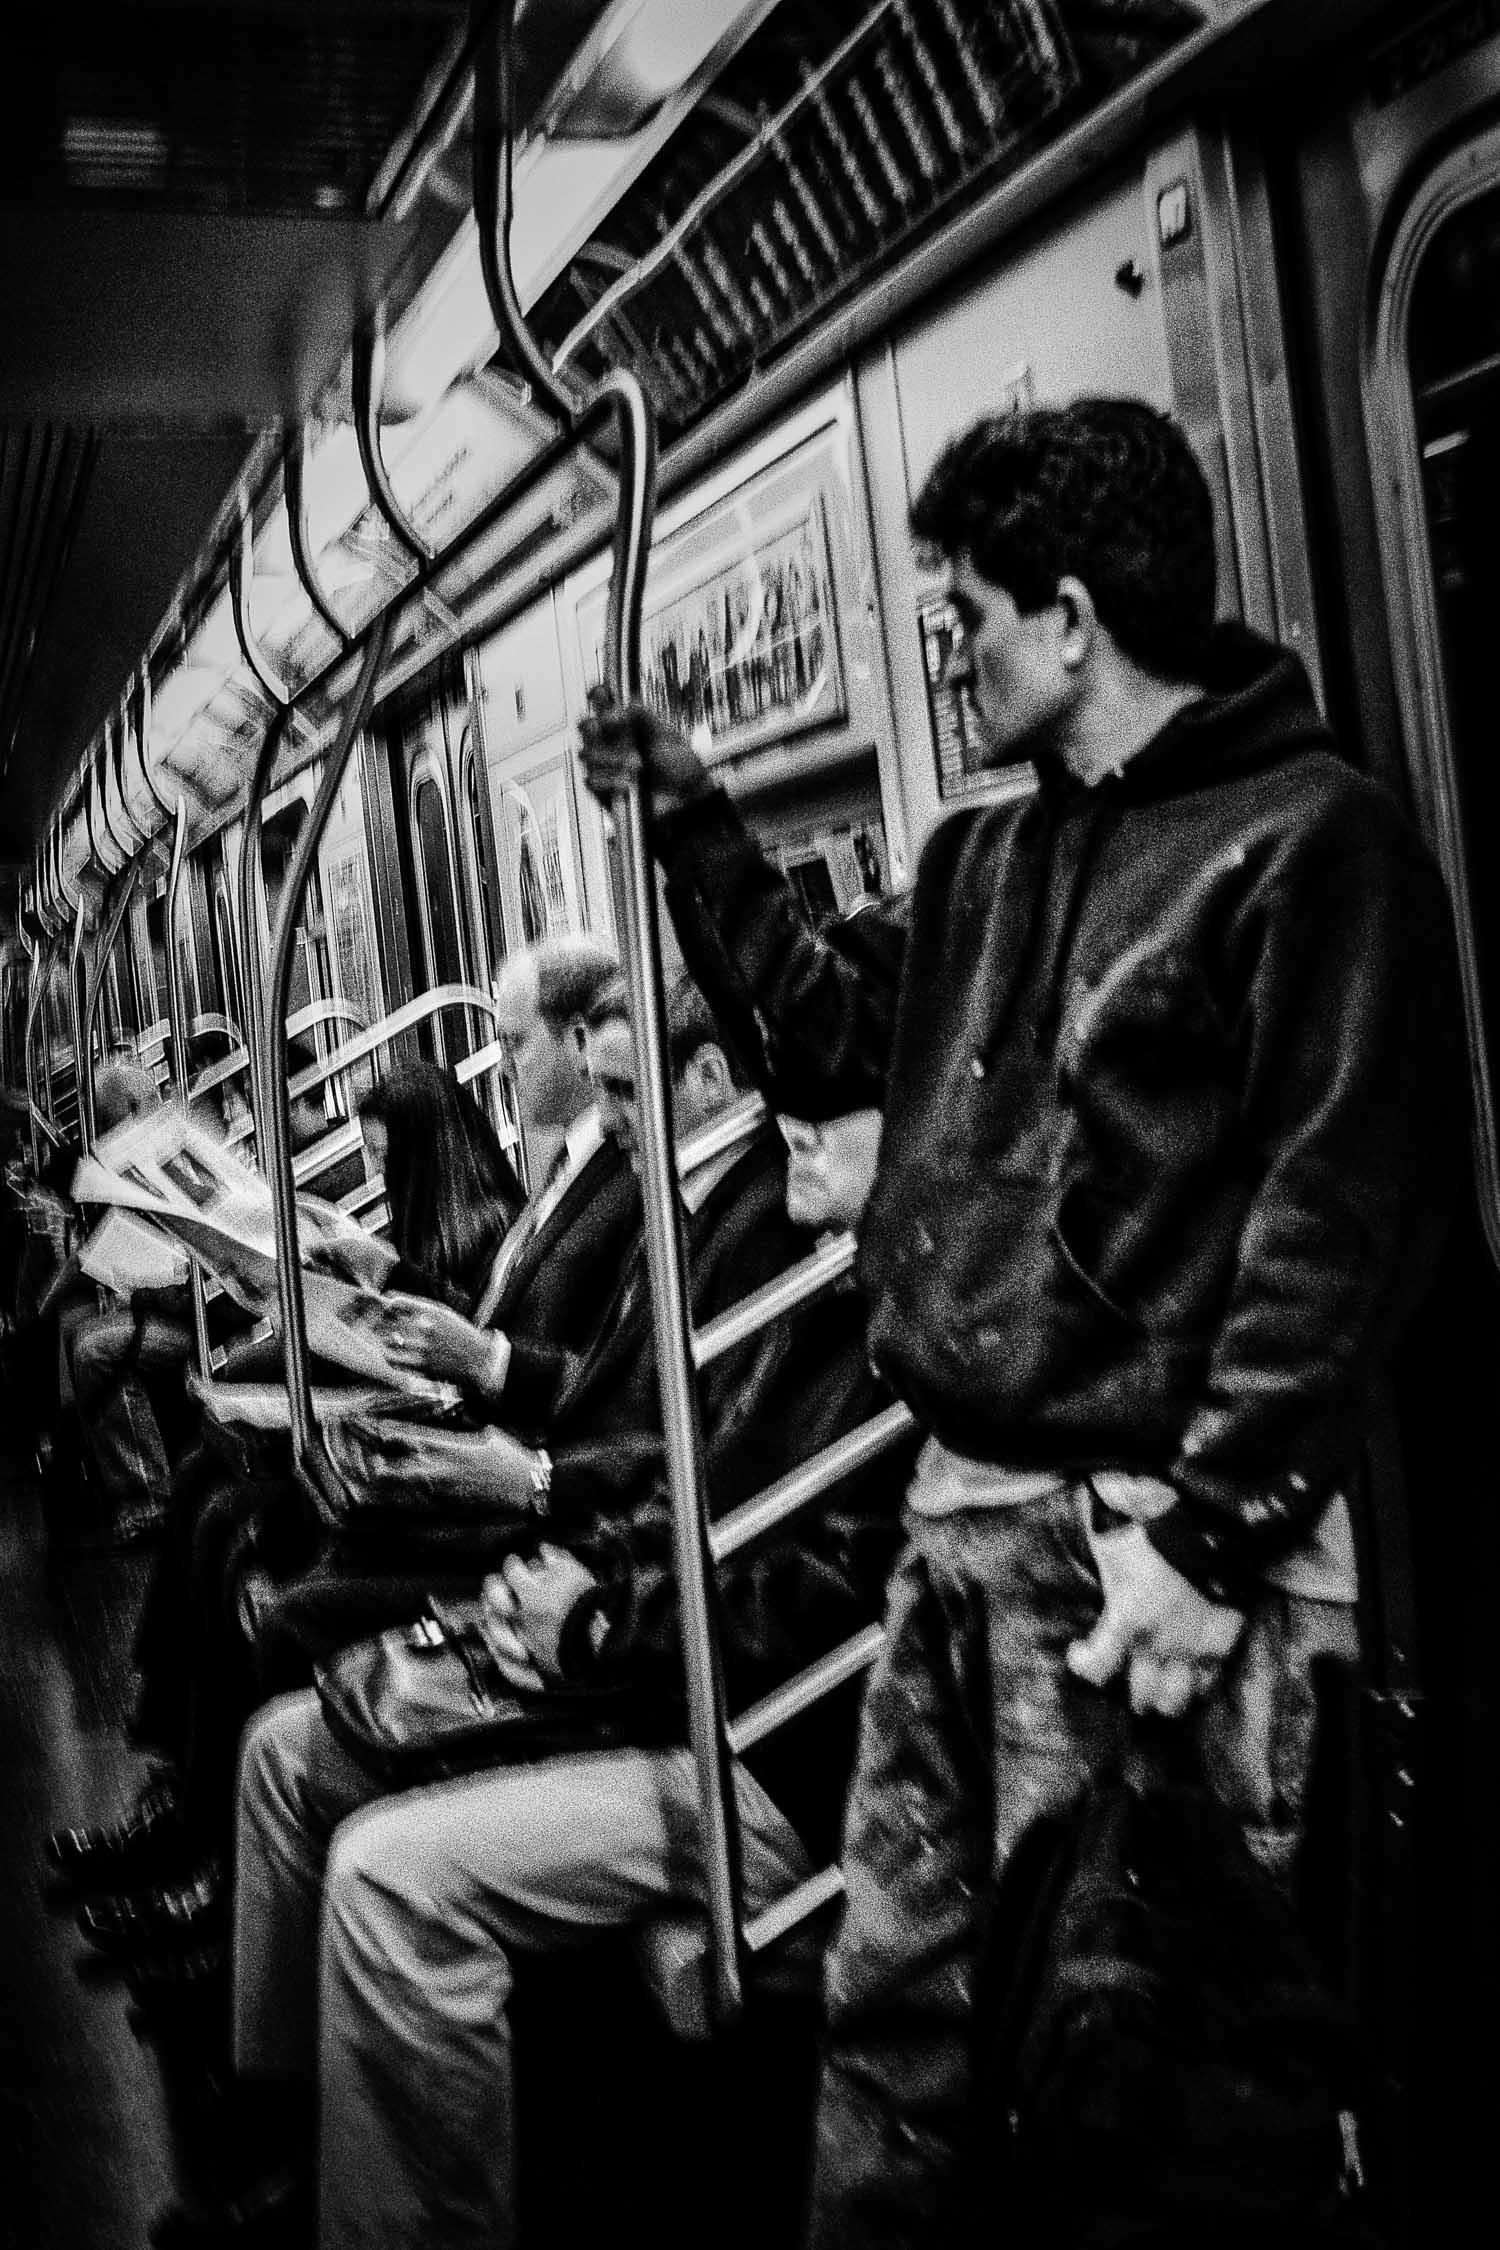 subway_10x15_8.jpg